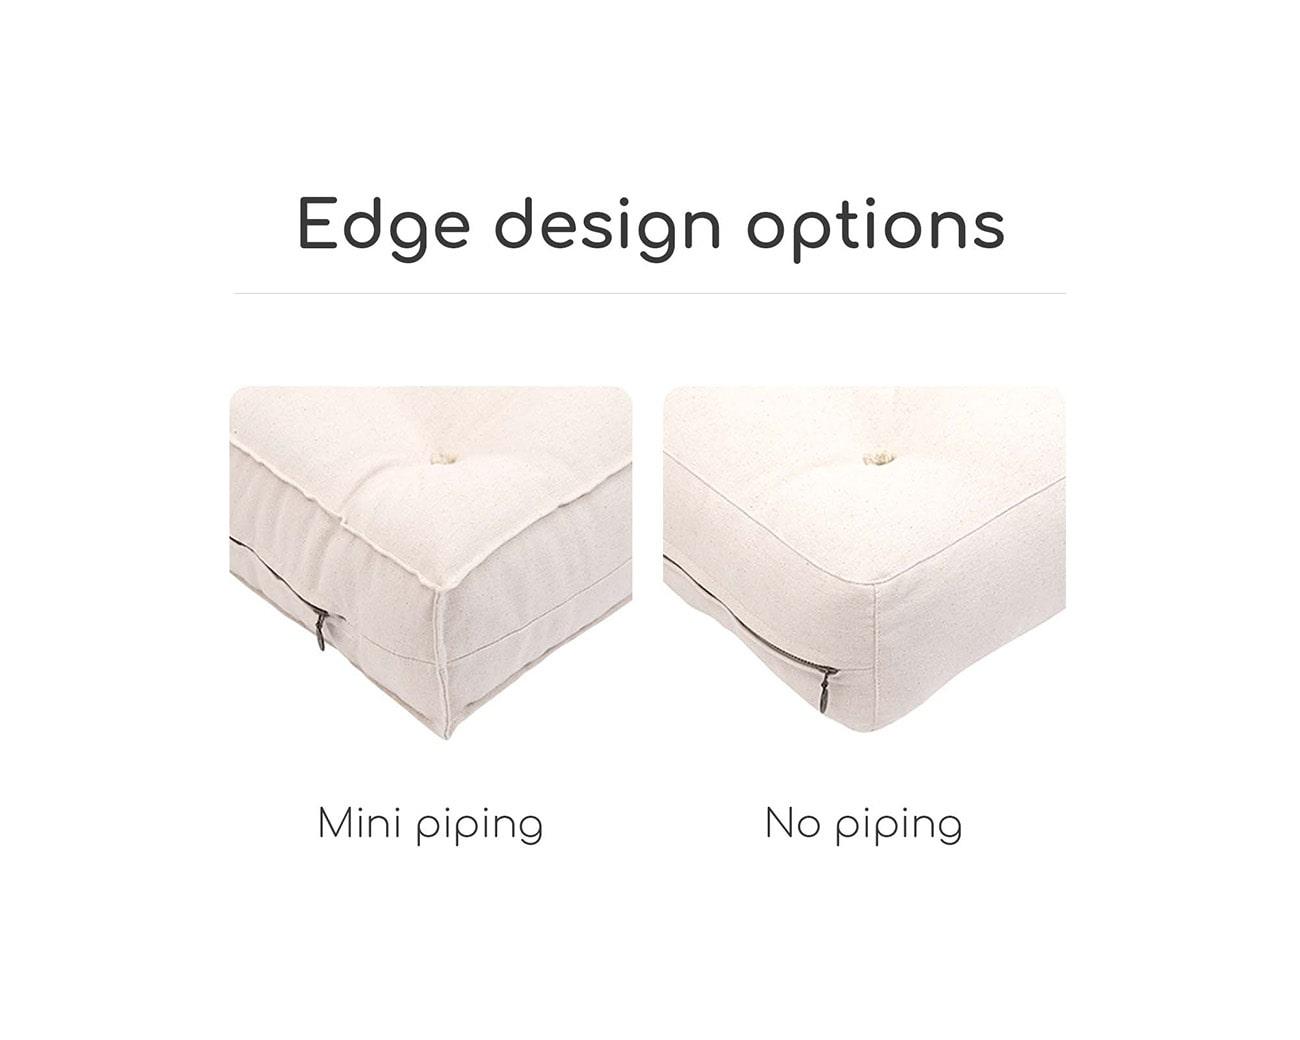 Piped vs Non-piped edges